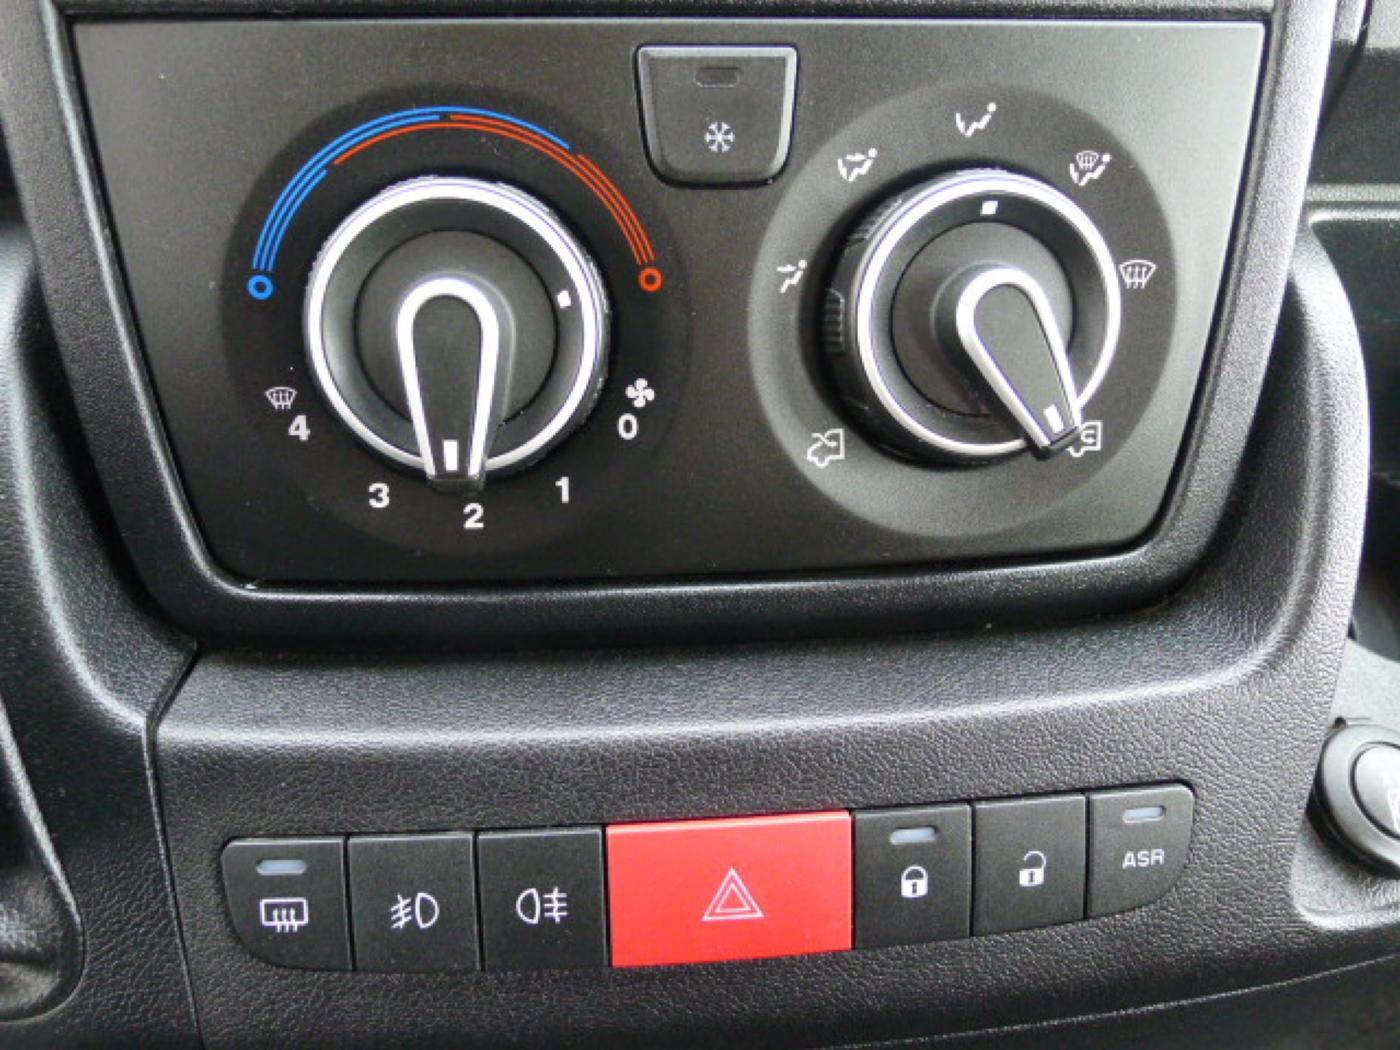 Peugeot Boxer 2,2 HDI PANORAMA 8míst+2 x klima+We - 11